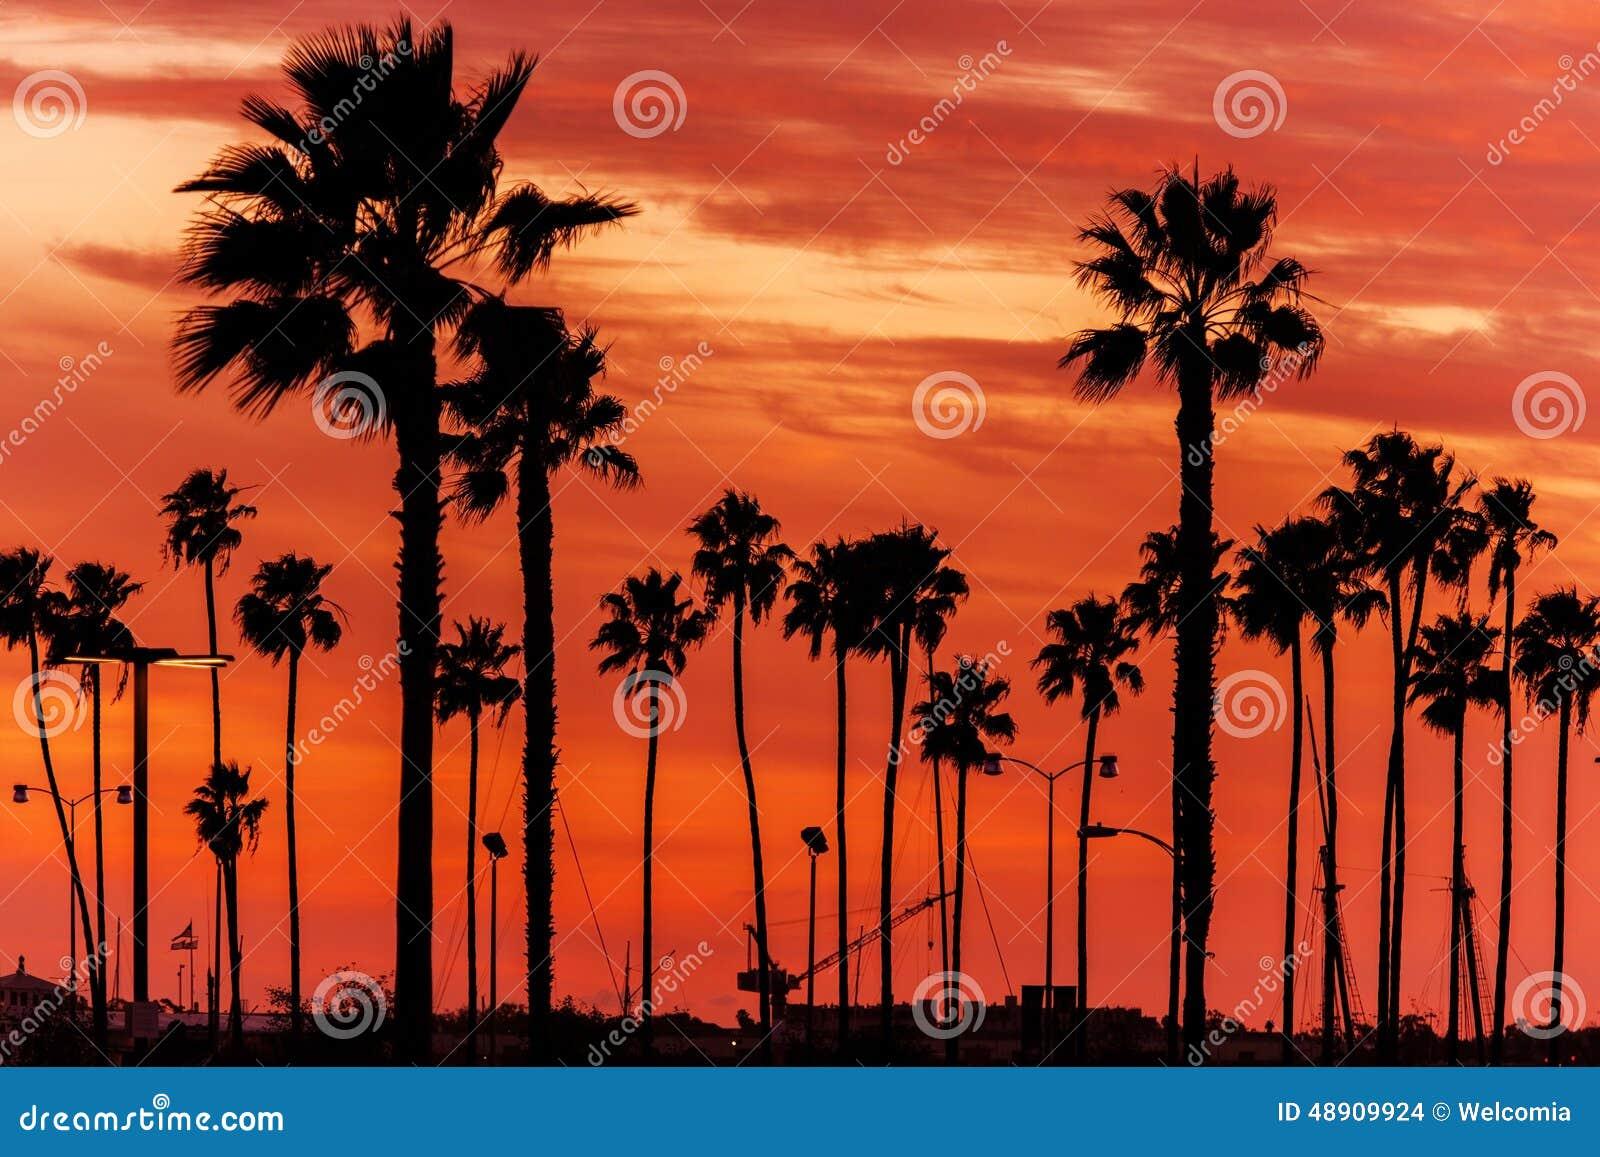 California Sanset Scenery